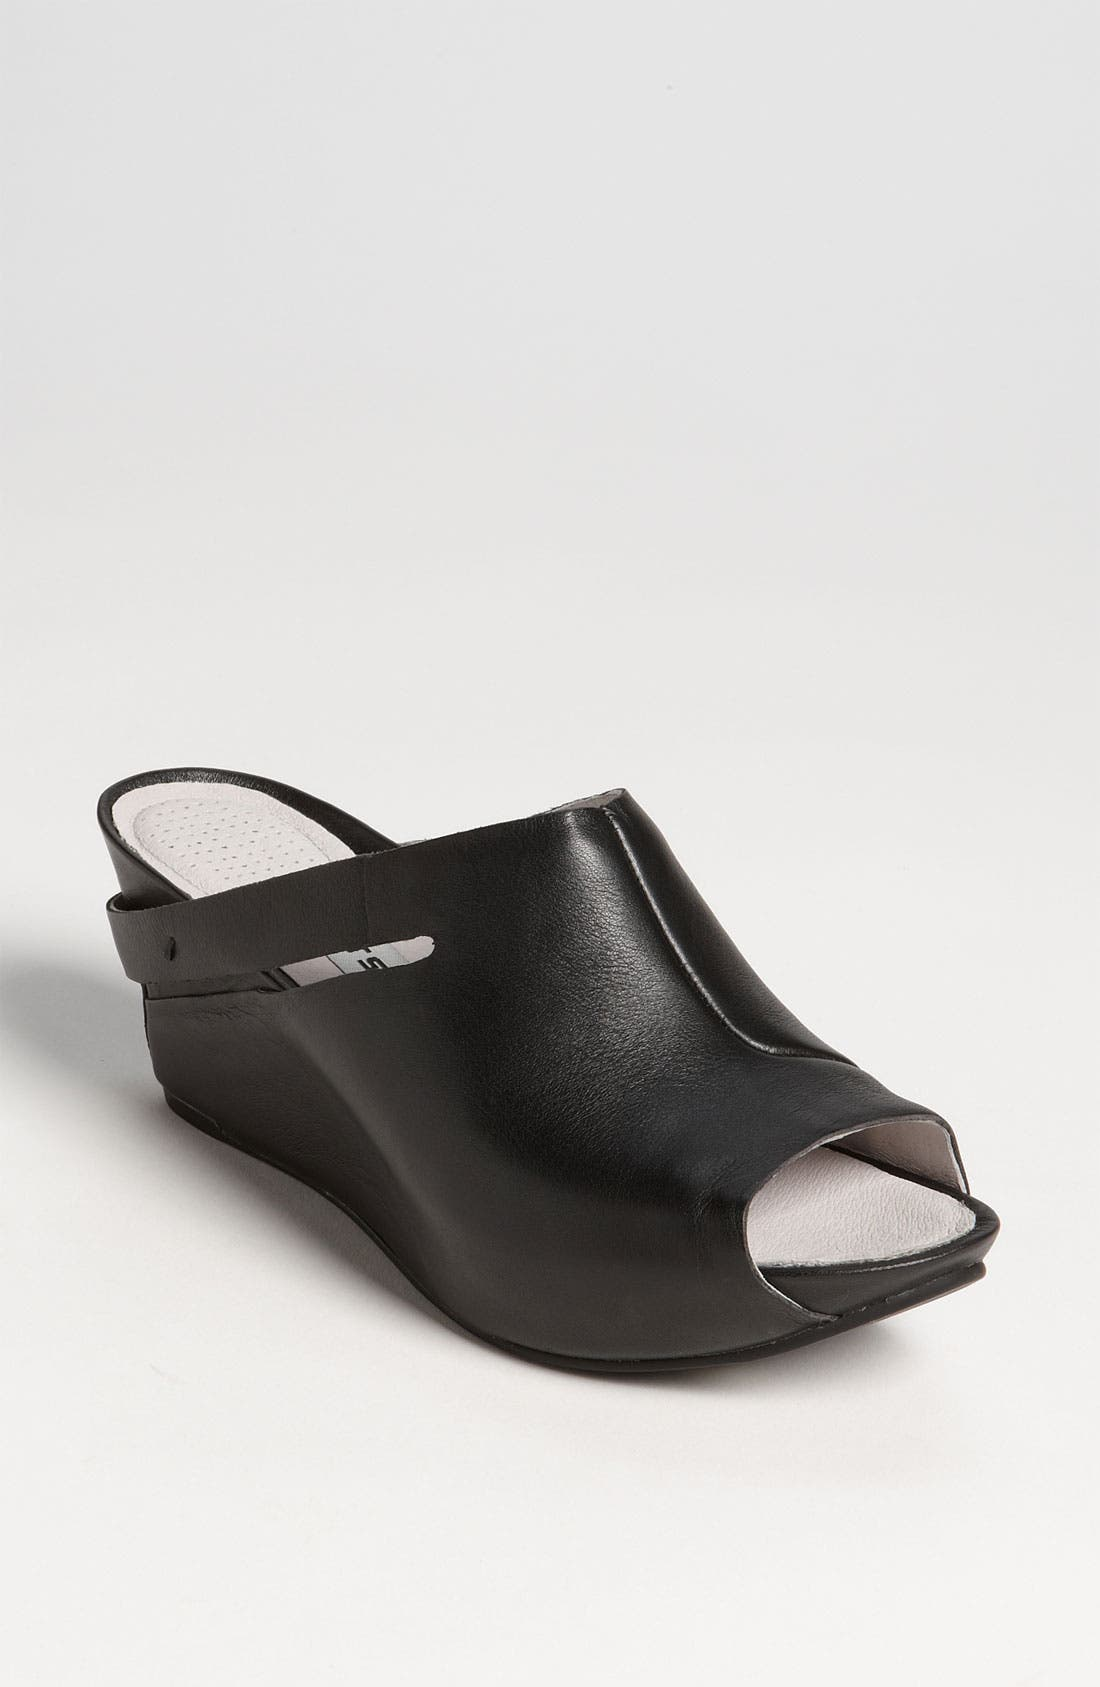 Main Image - Tsubo 'Ovid' Sandal